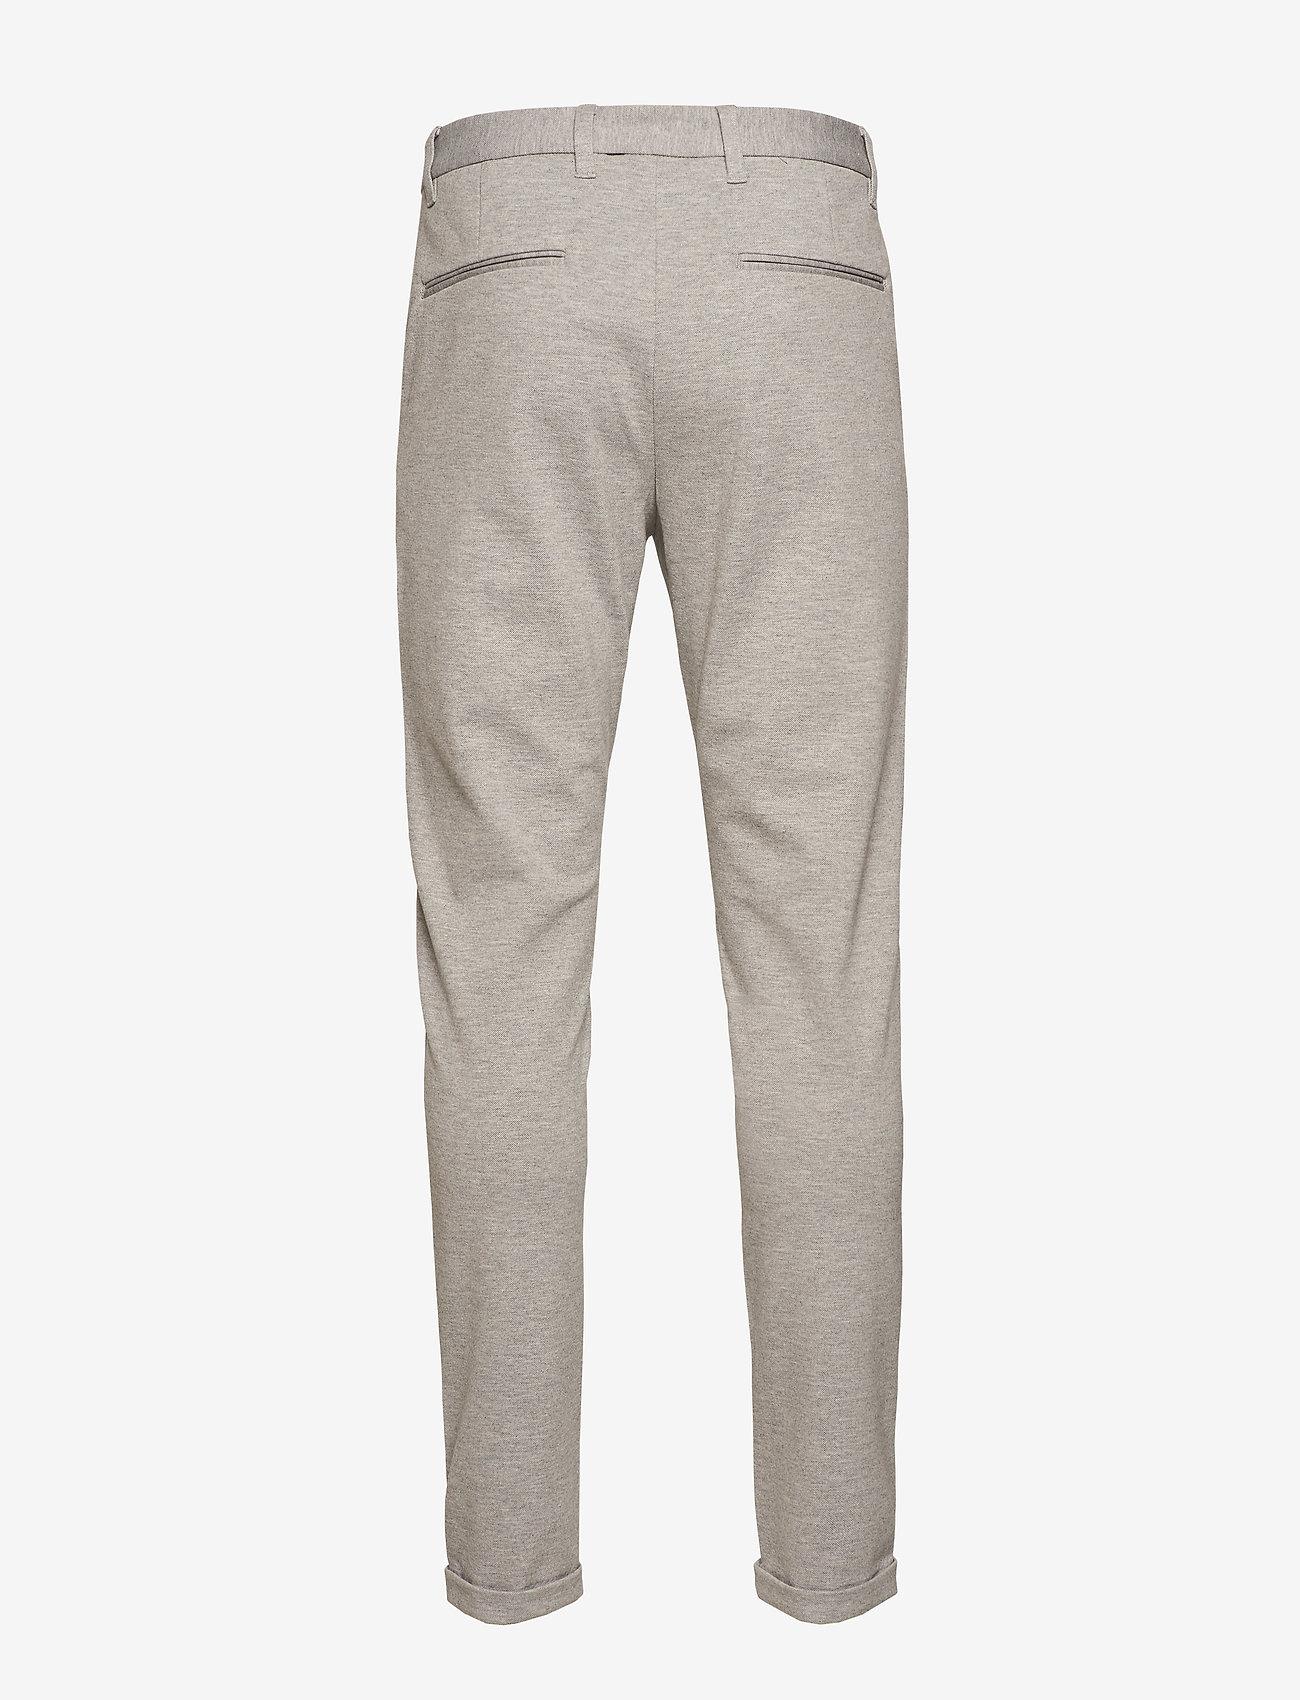 Lindbergh - Knitted pants normal length - spodnie na co dzień - lt grey mix - 1